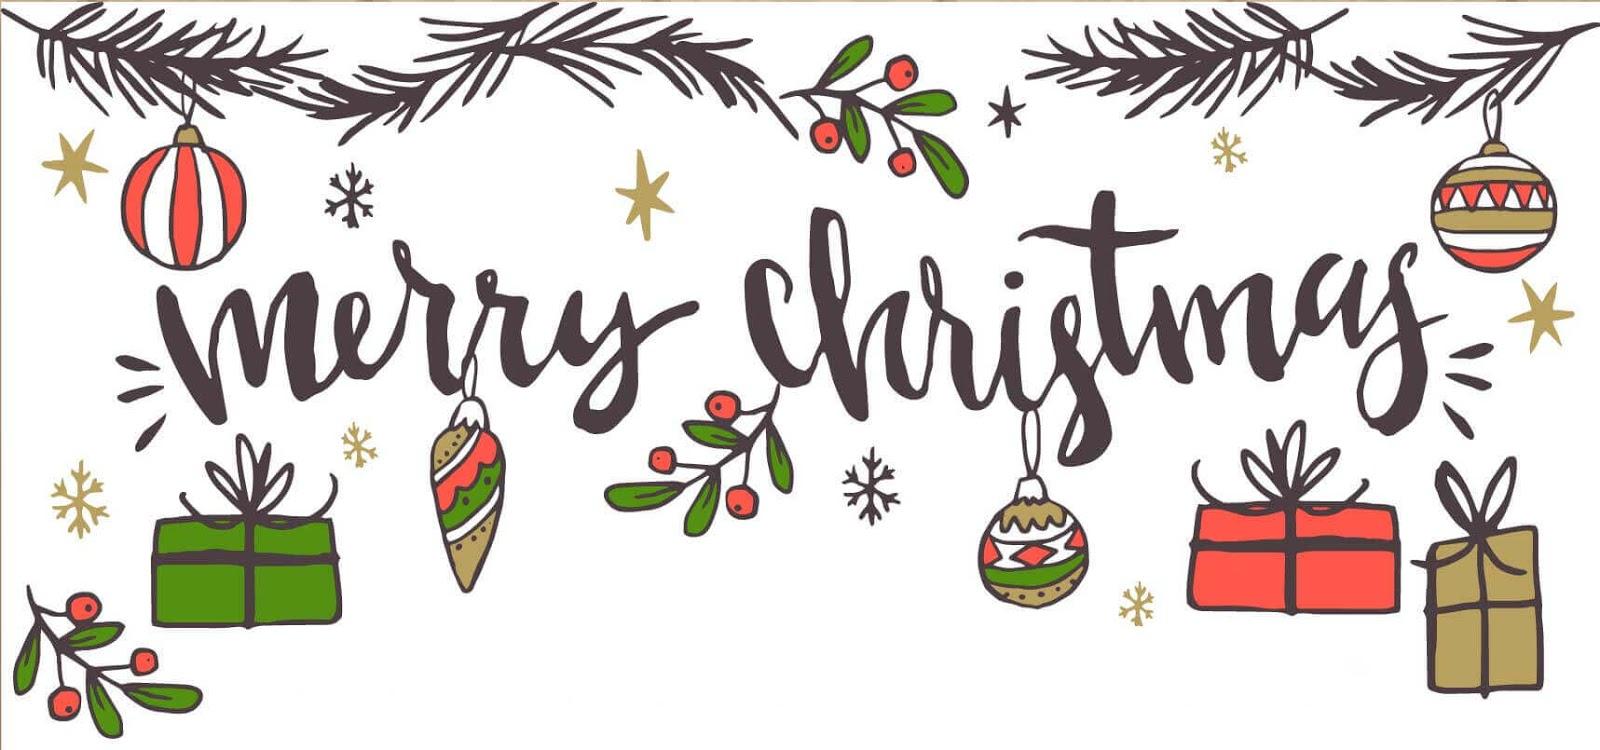 Merry Christmas Printable Banner Download Free